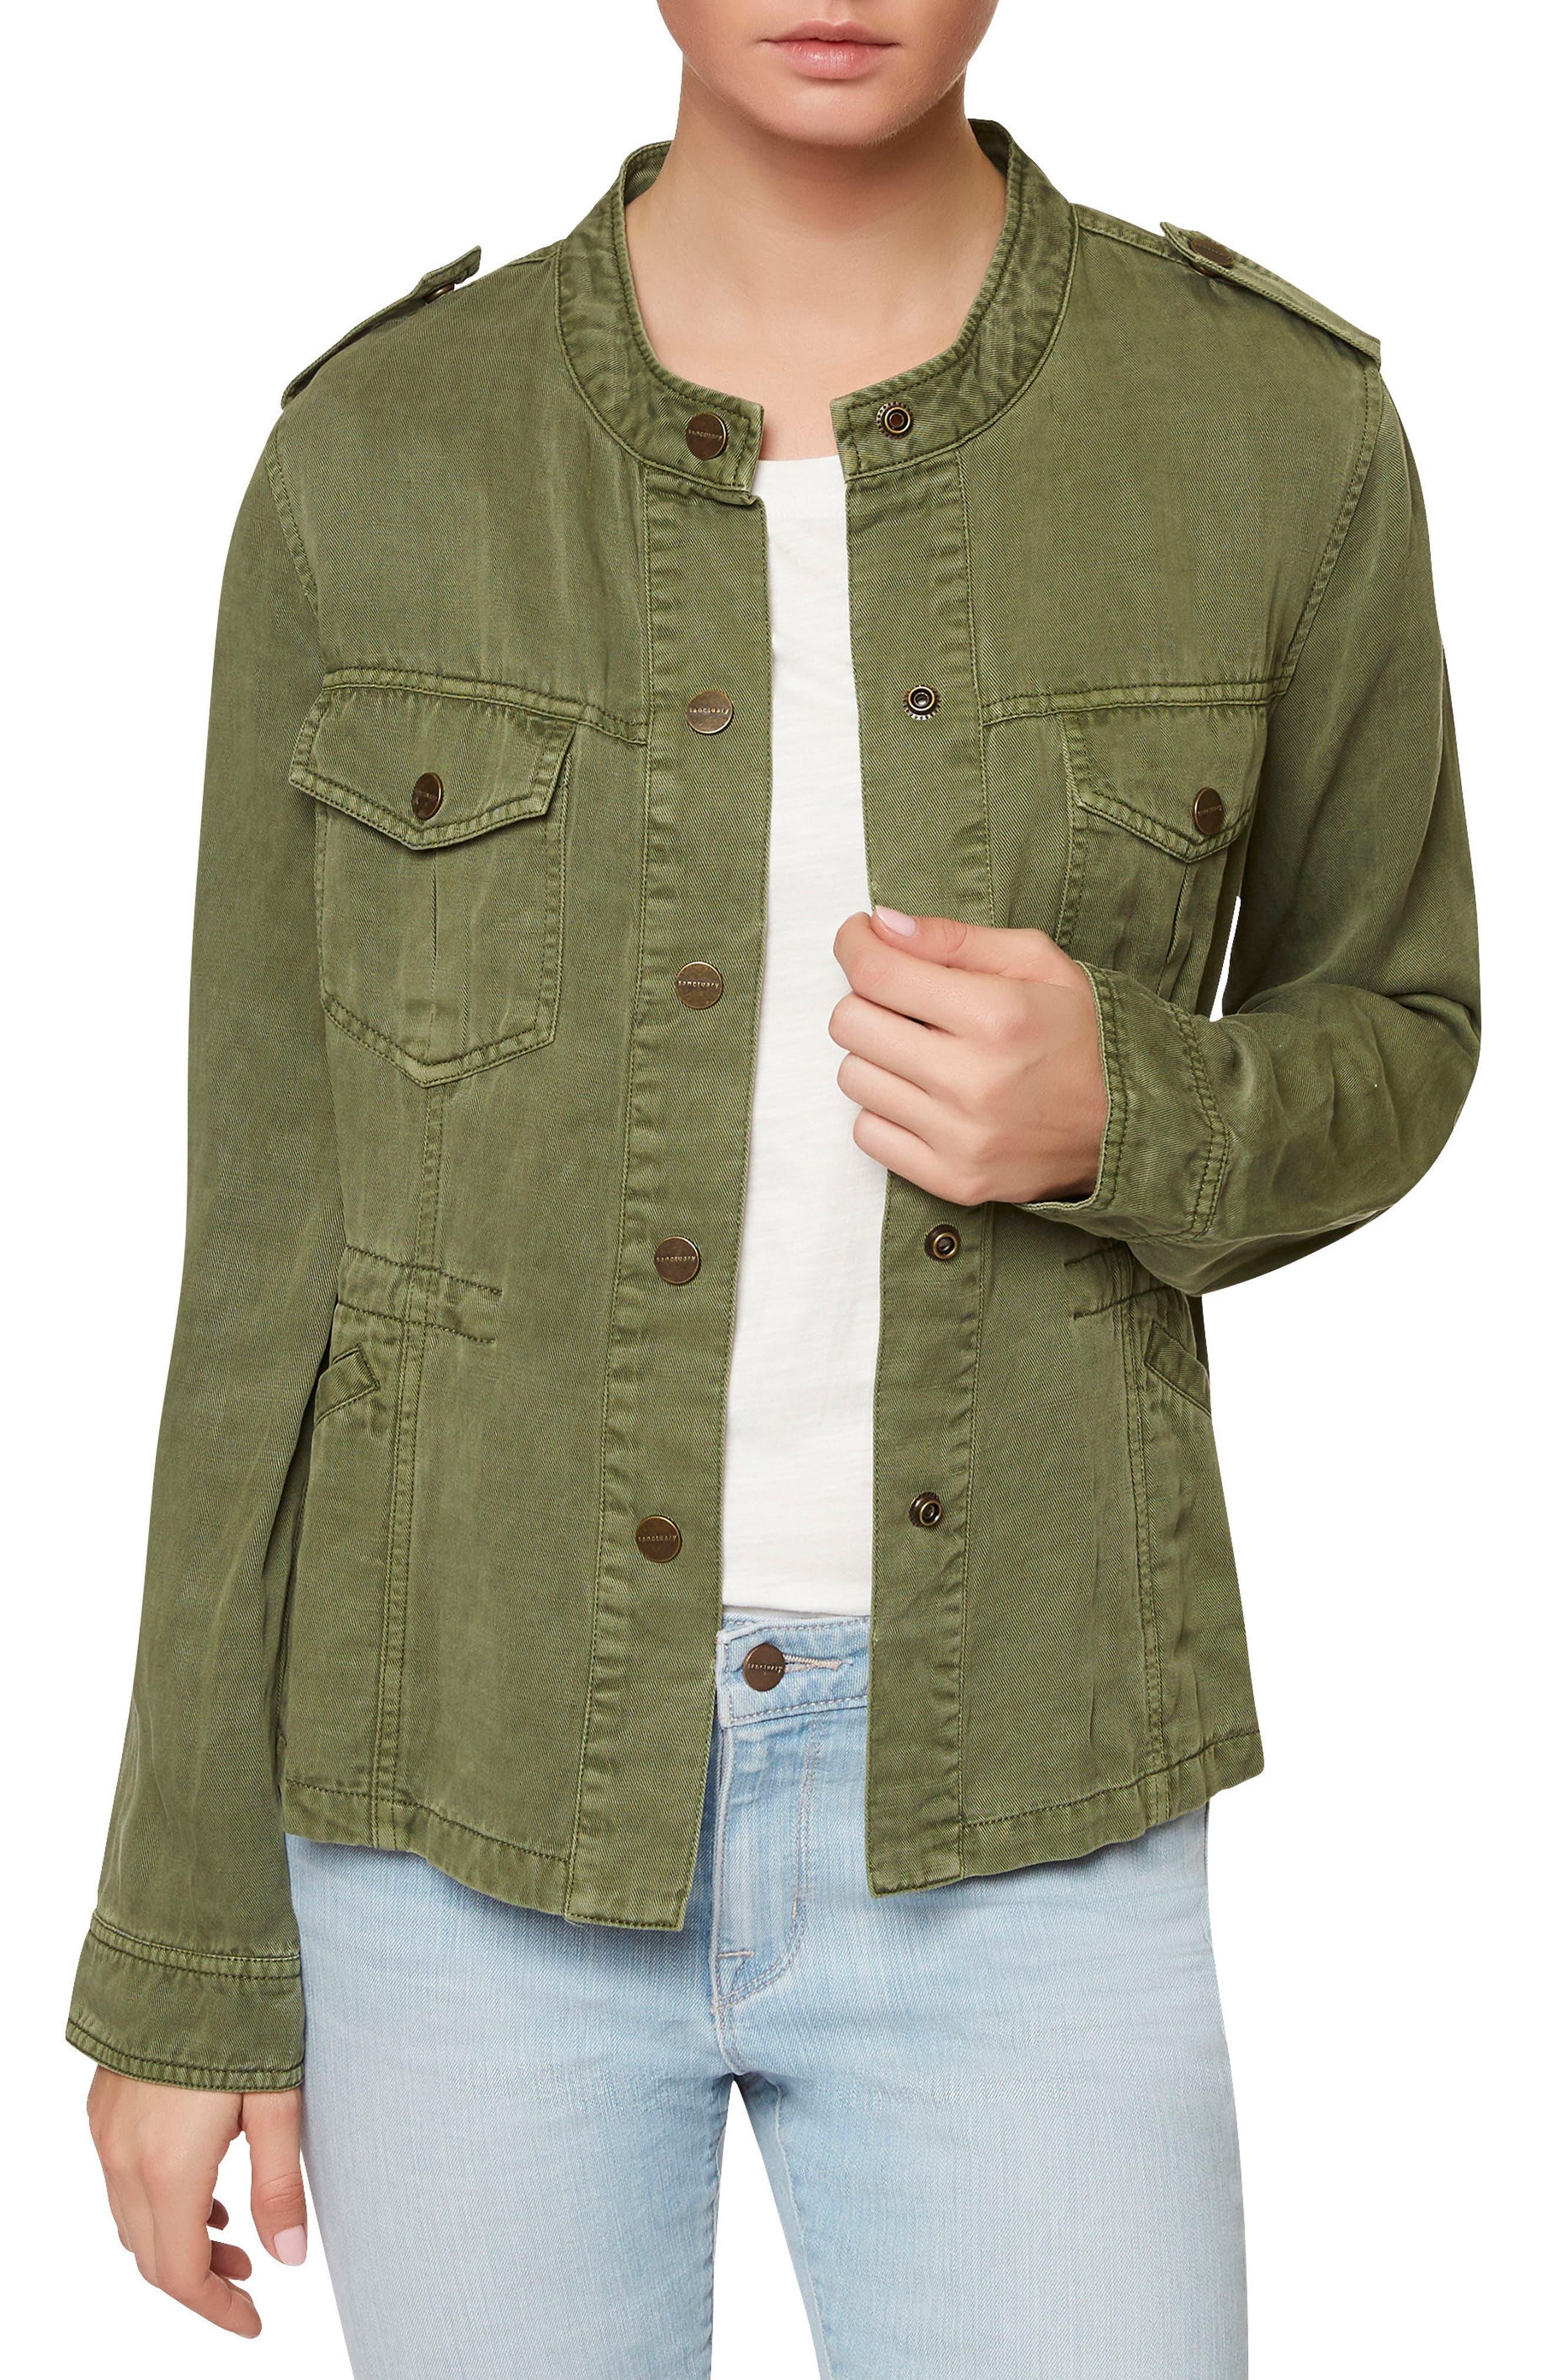 SANCTUARY, Marni Twill Utility Jacket, Main thumbnail 1, color, 300